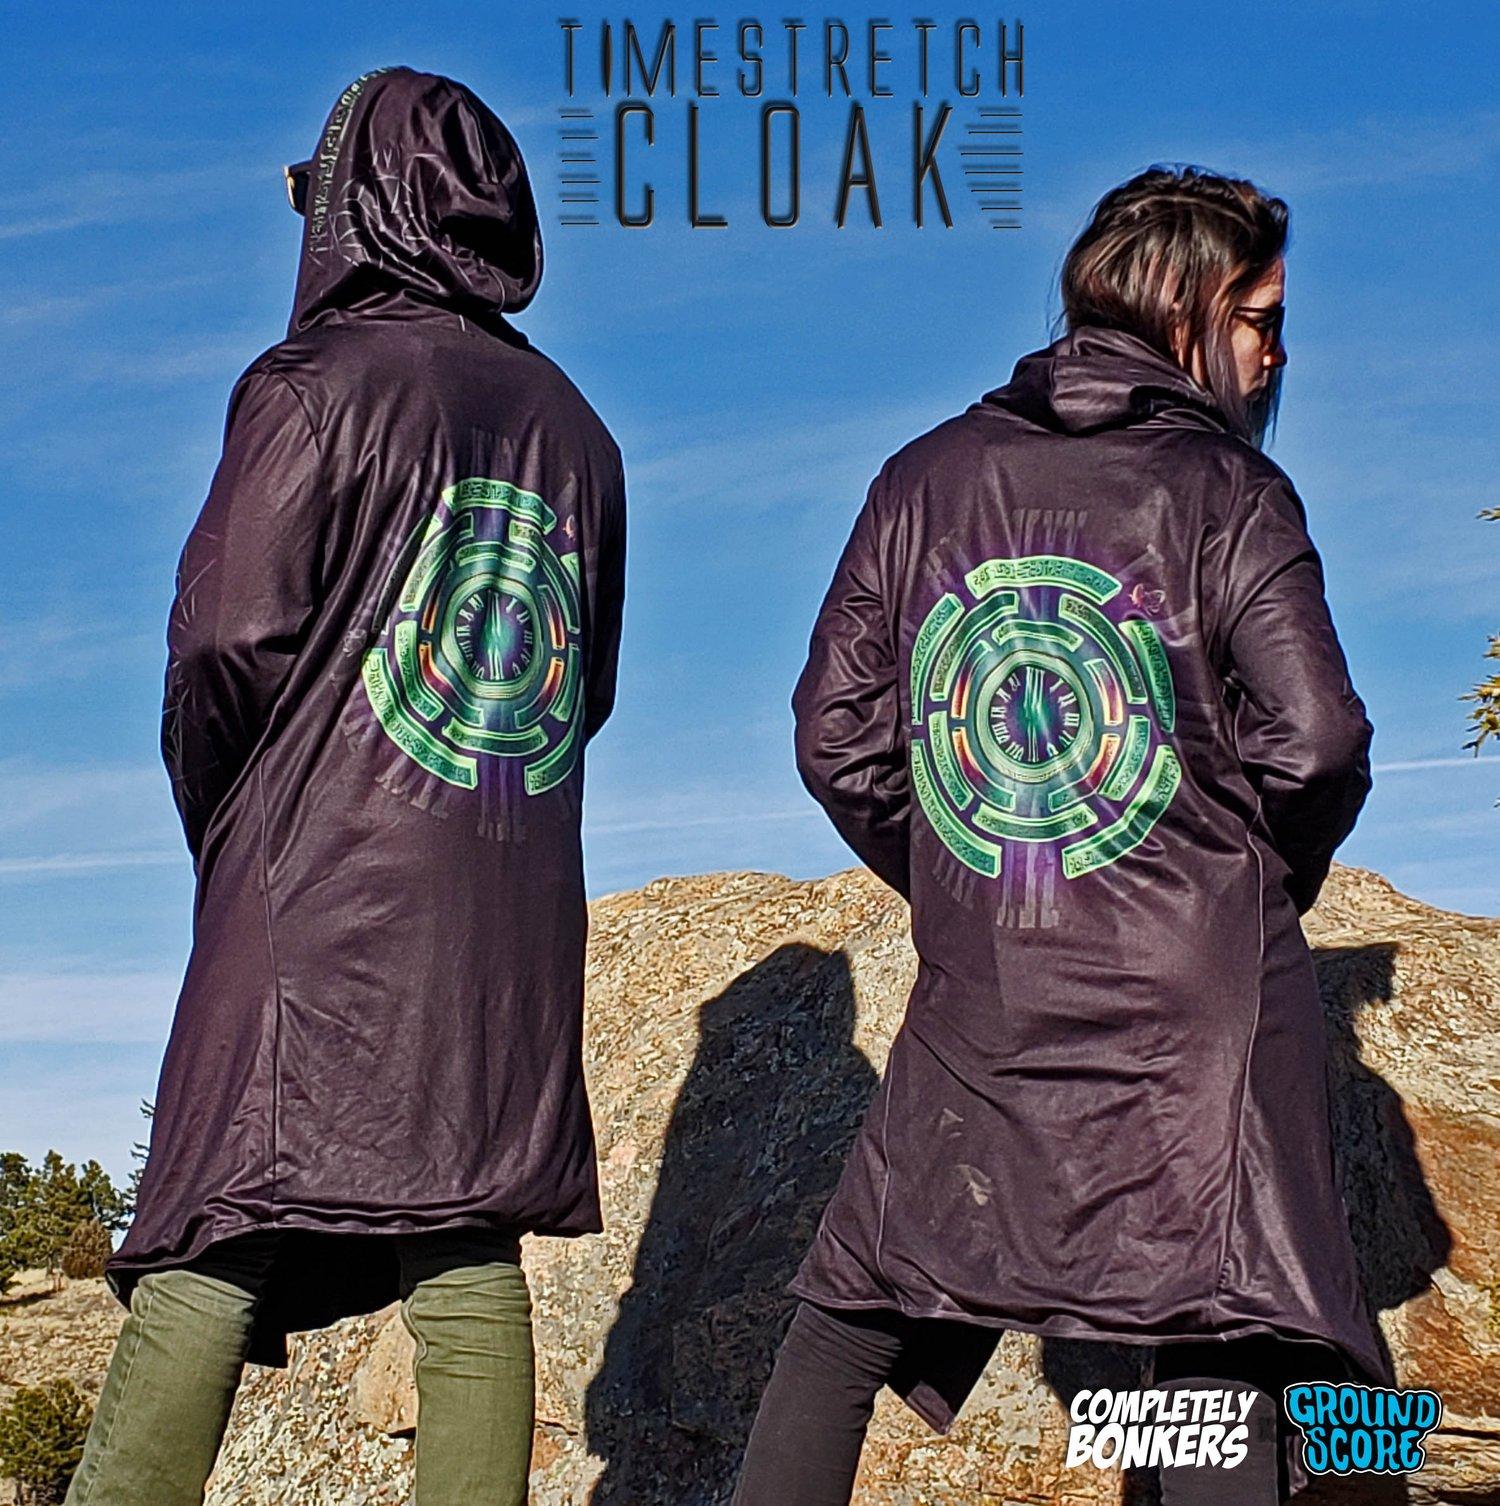 Completely Bonkers - Timestretch Cloak